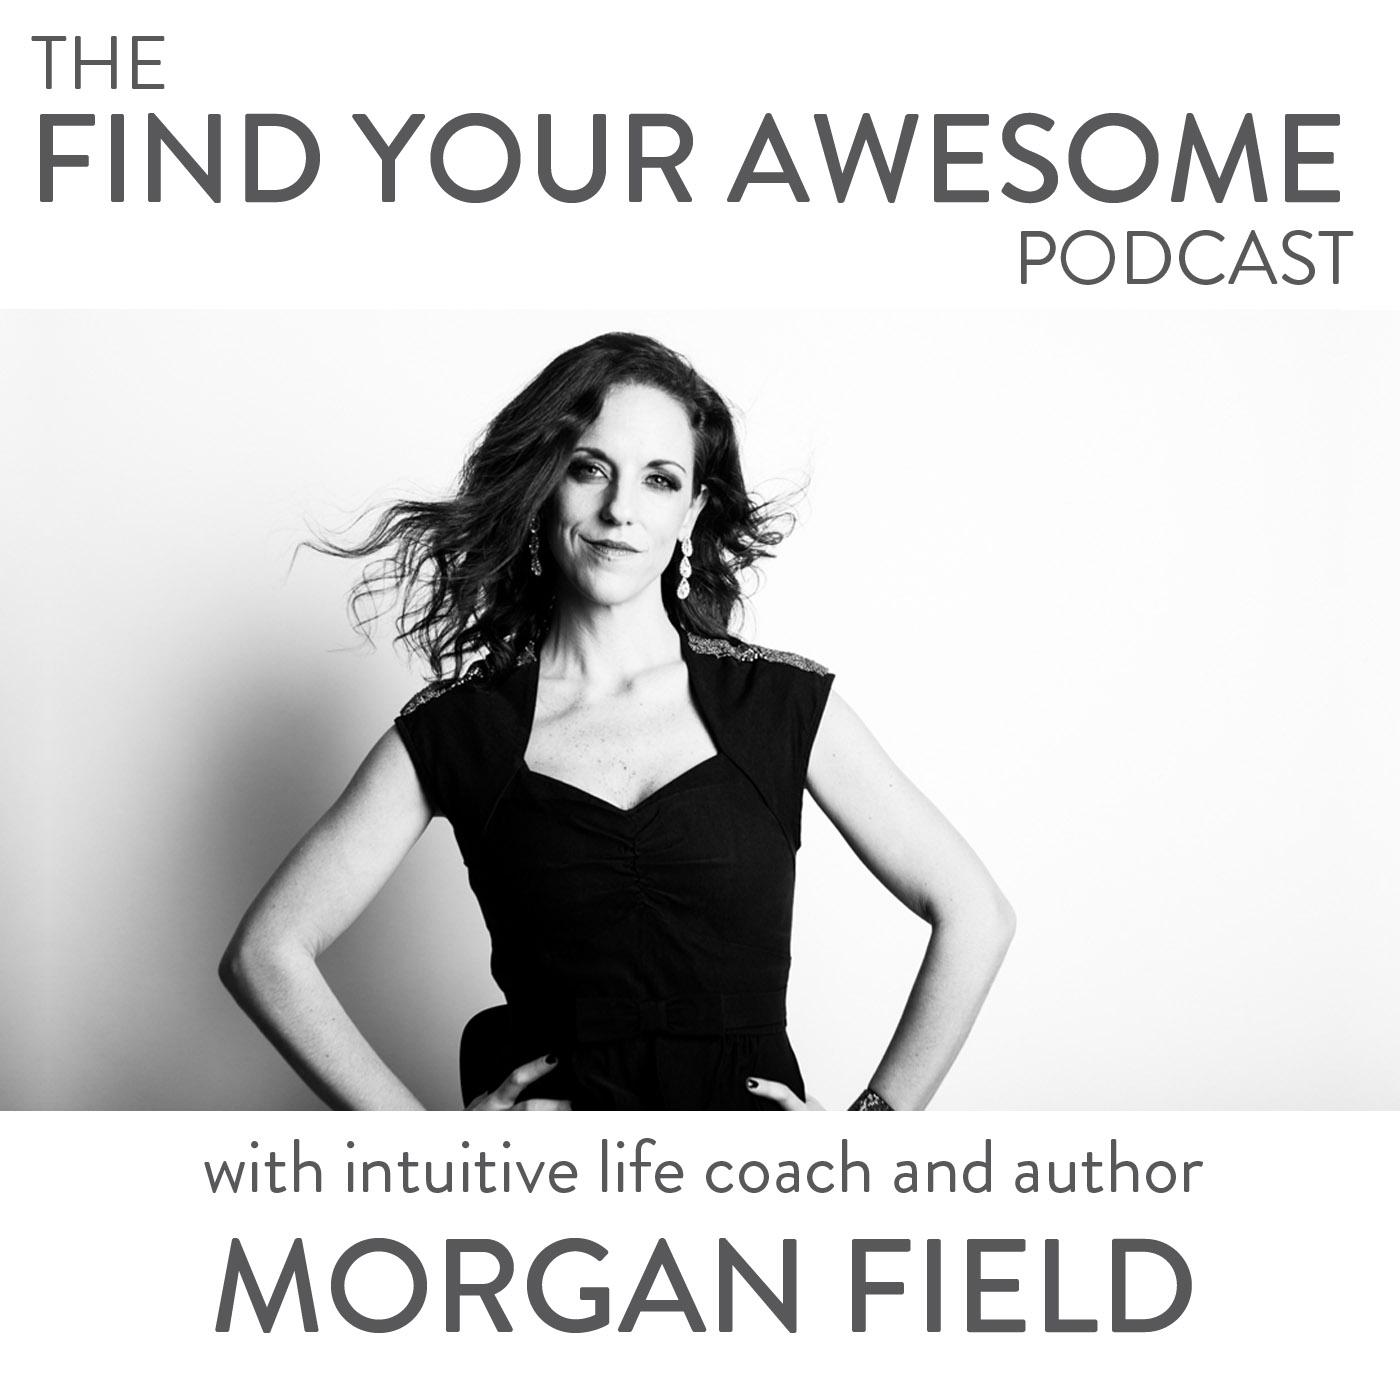 MorganField_podcast_coverart.jpg